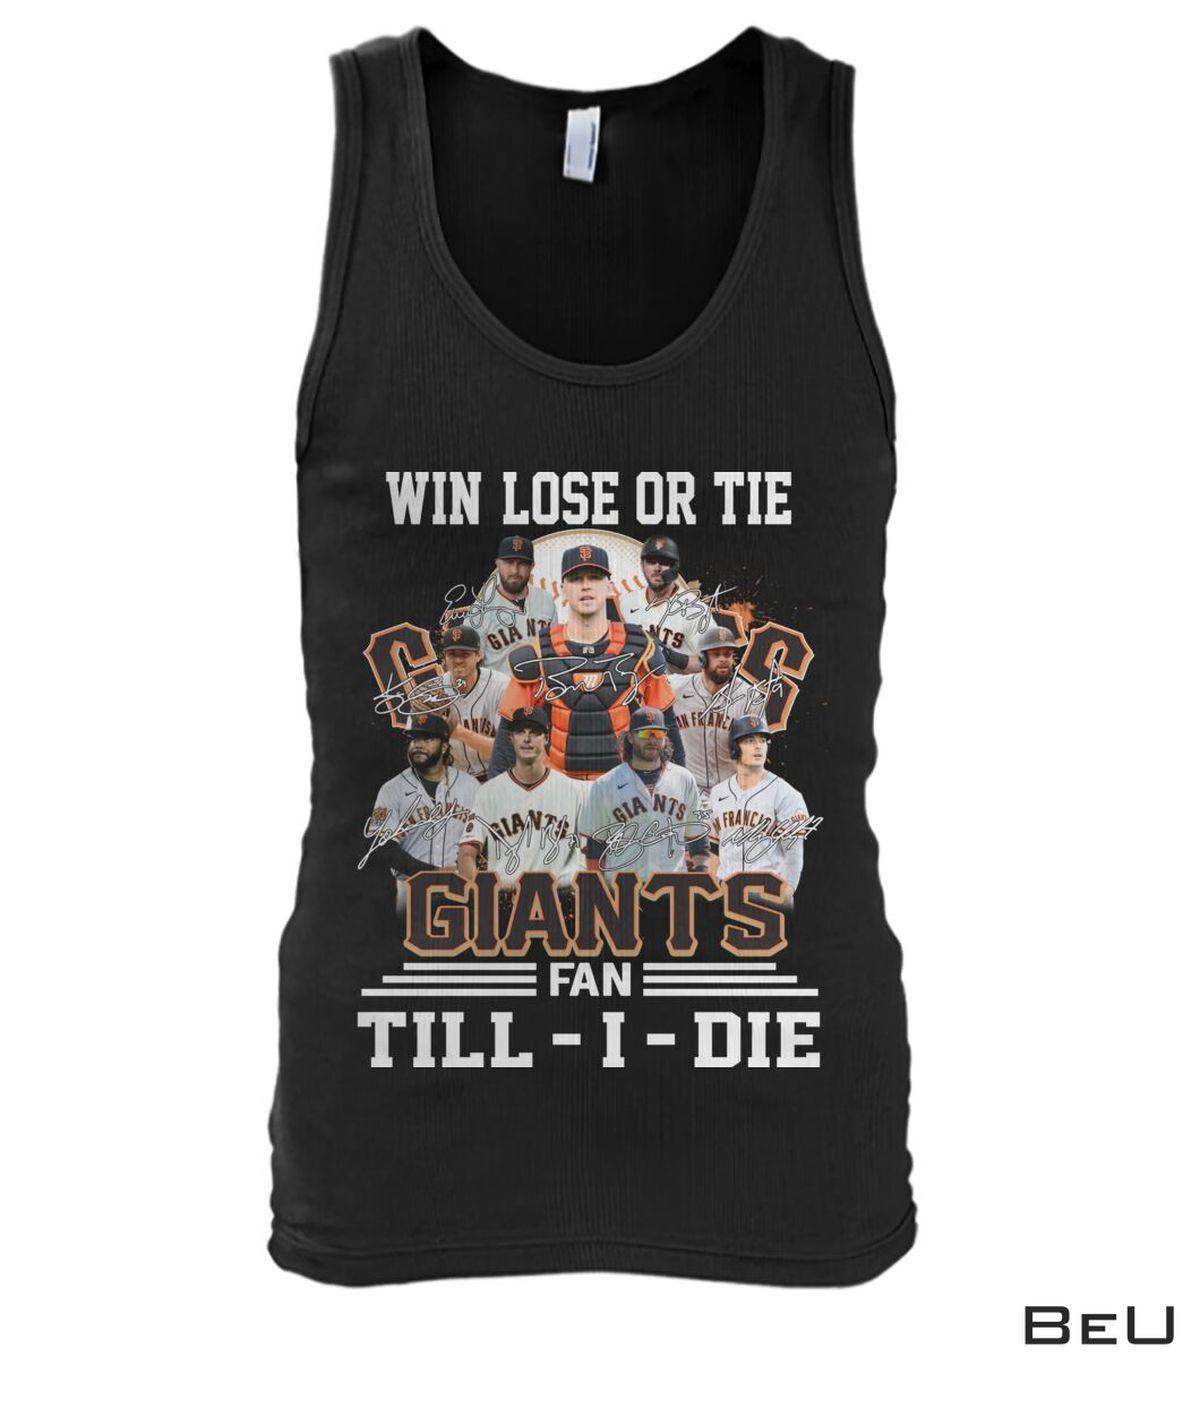 Awesome Win Lose Or Tie San Francisco Giants Fan Till I Die Shirt, Hoodie, Sweatshirt